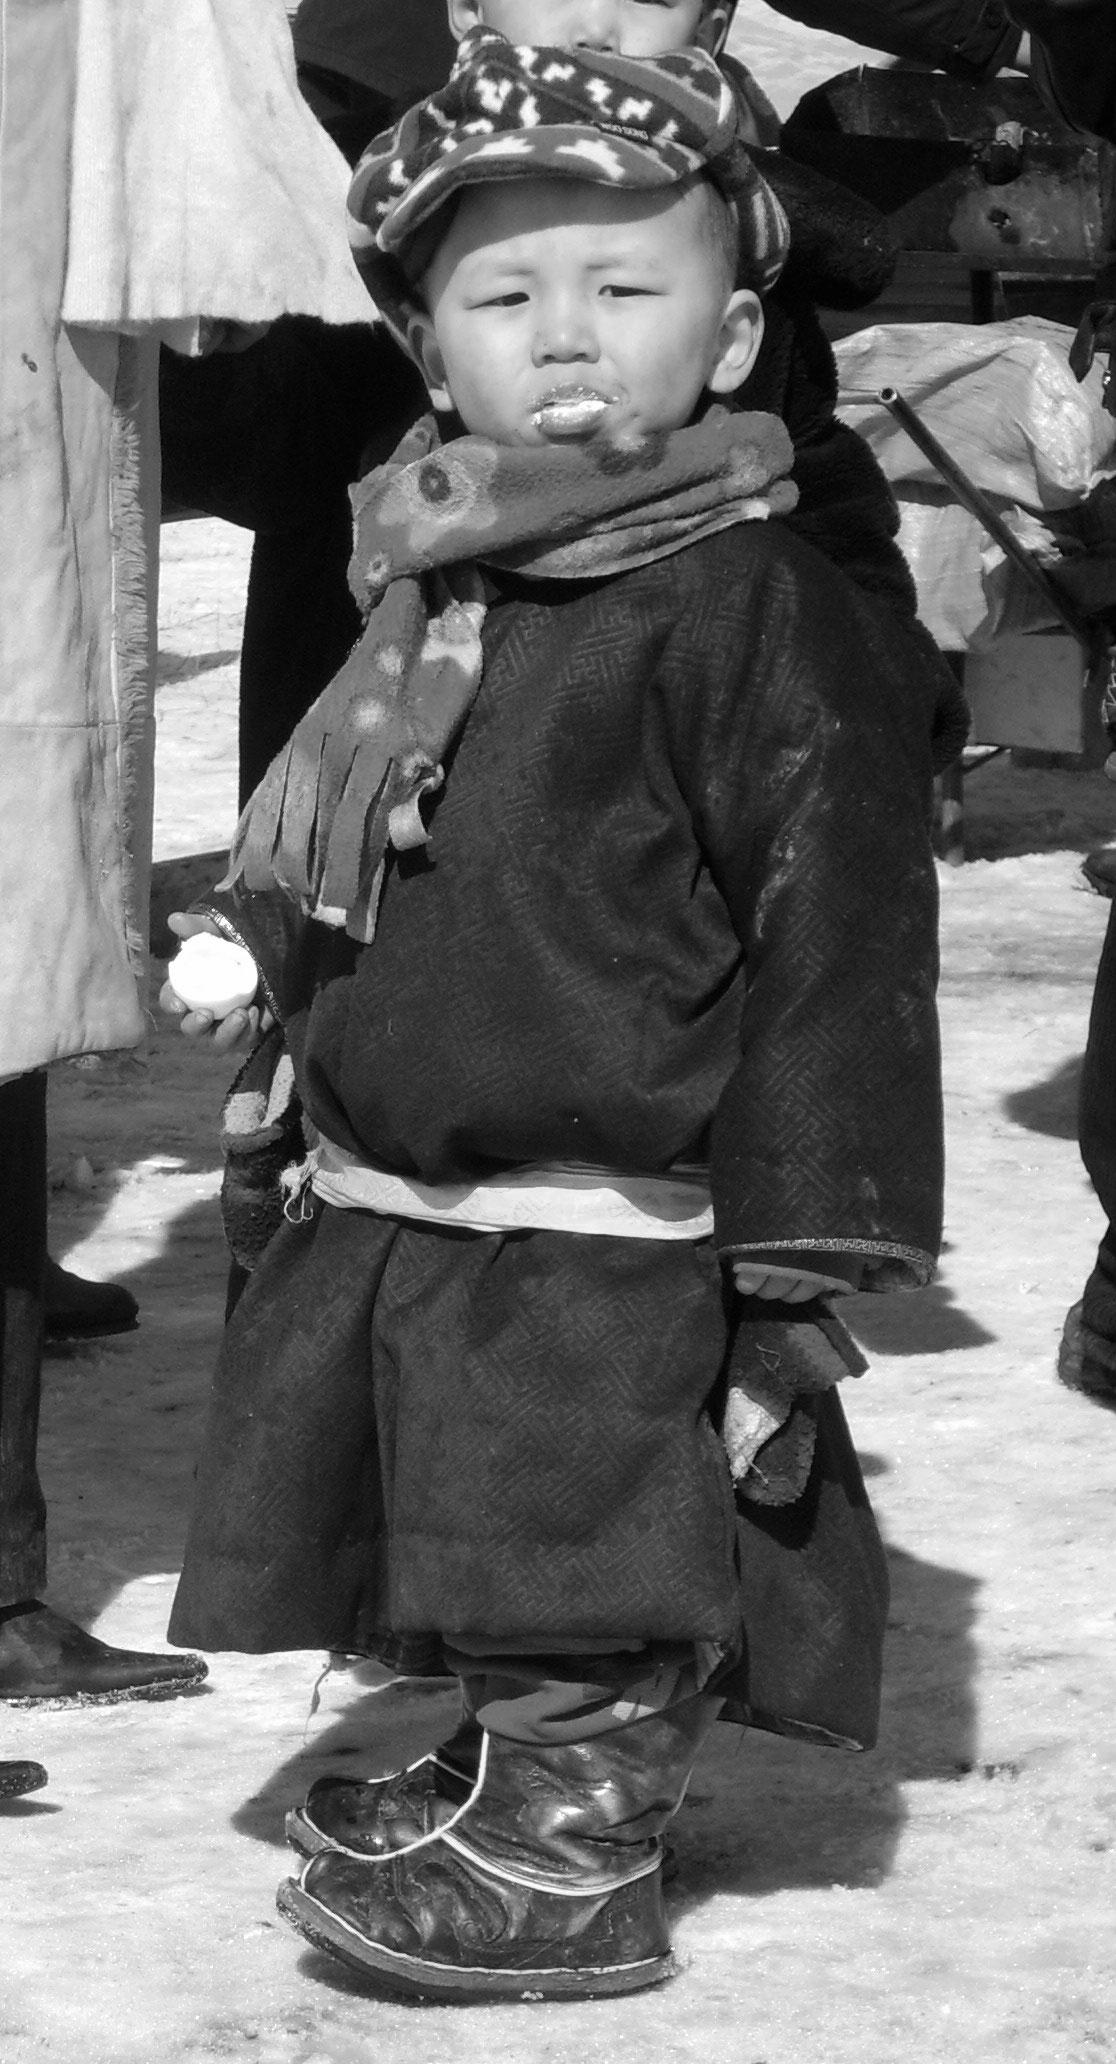 free image: mongolian boy | libreshot public domain photos